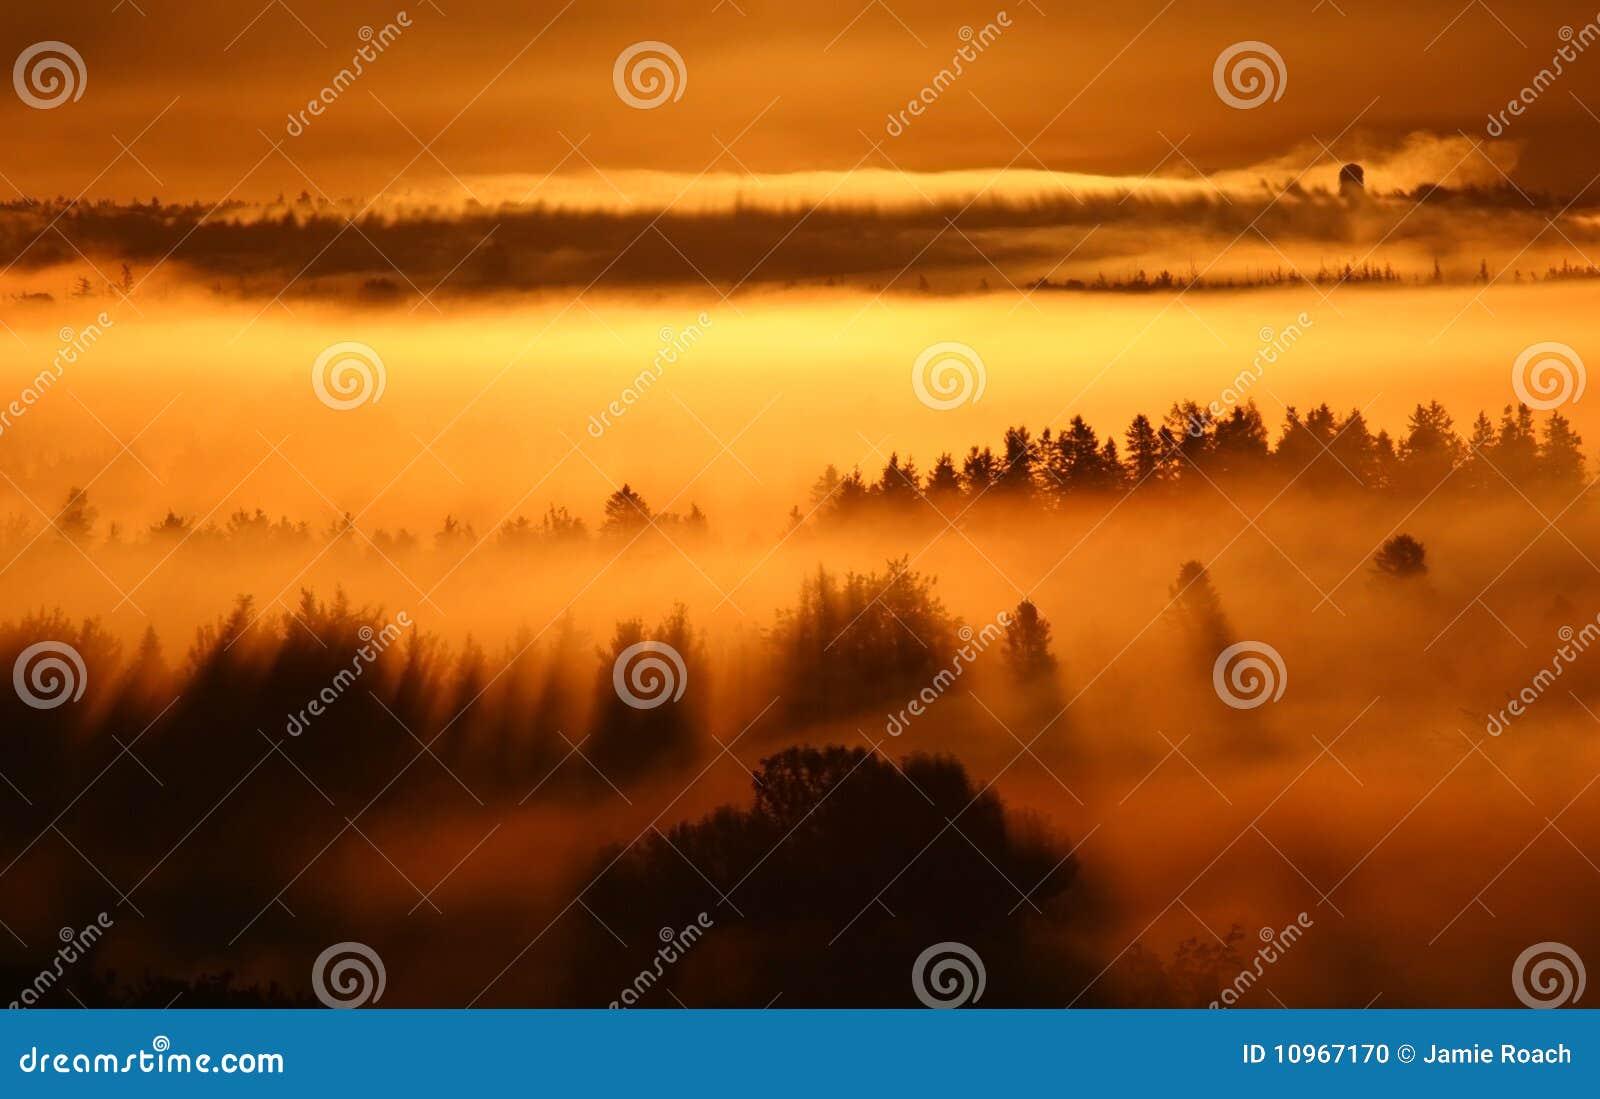 Dimmasoluppgång